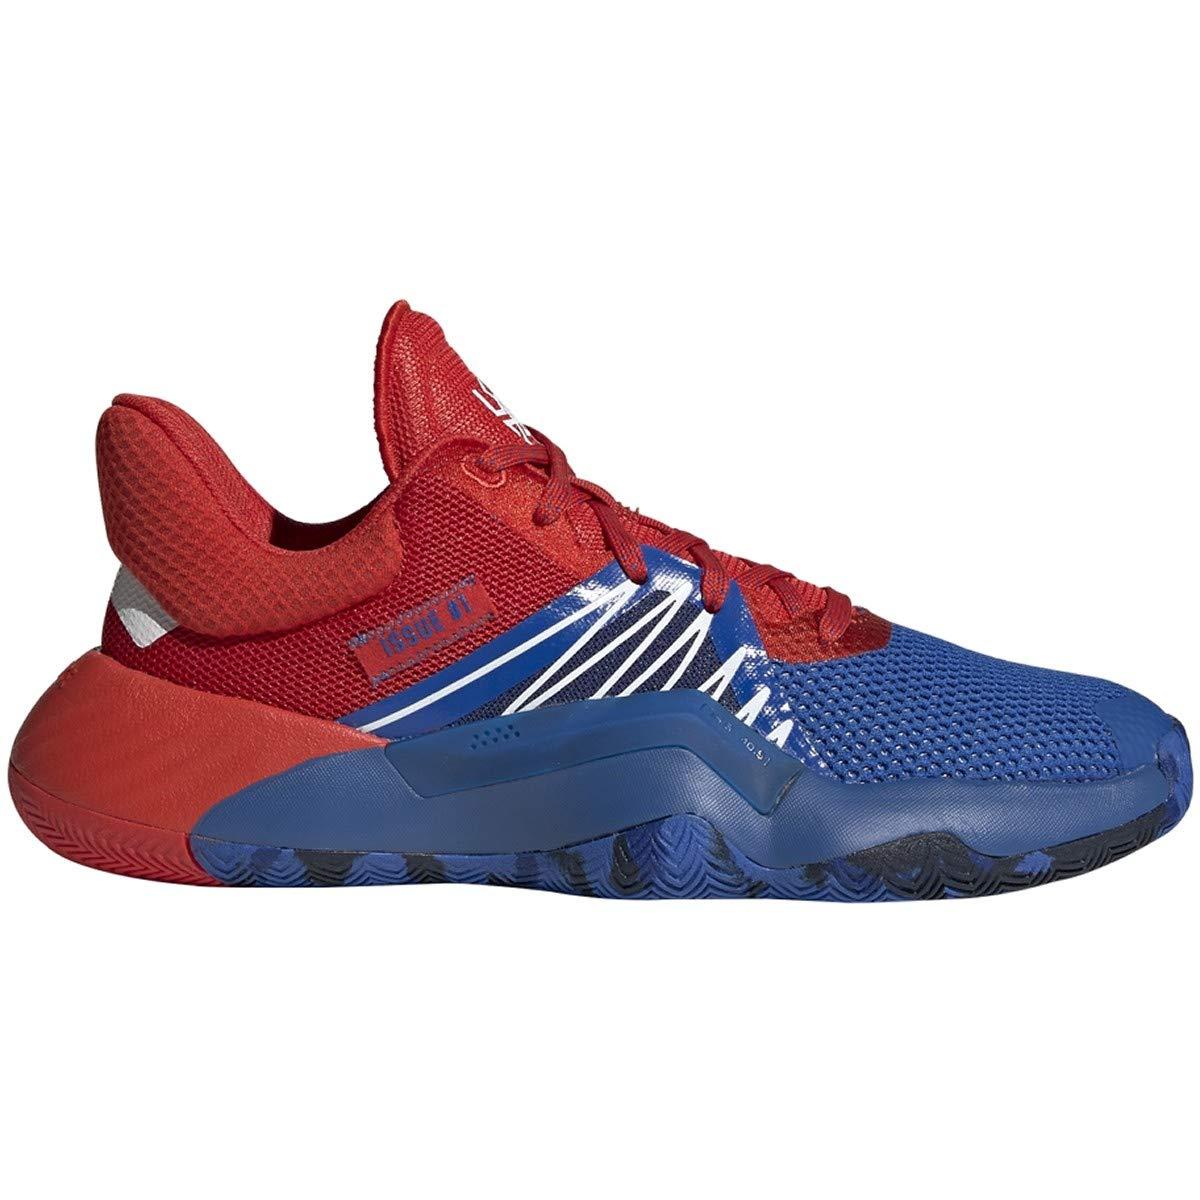 adidas Boy's D.O.N. Issue #1 Basketball Shoe, Blue/Red/White, 6 Medium US Big Kid